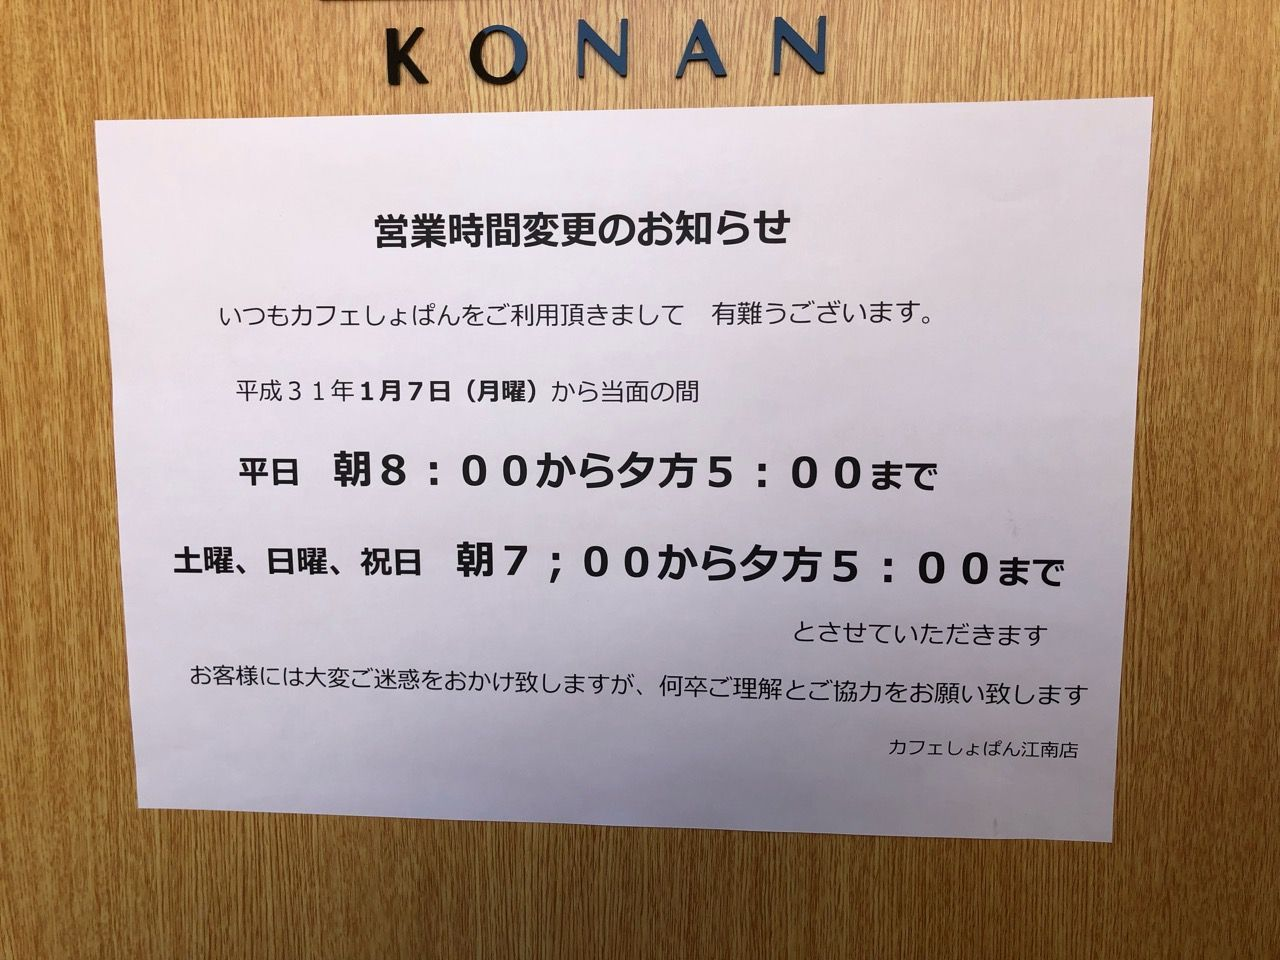 『cafe しょぱん【chopin】KONAN』店舗入口営業時間お知らせ